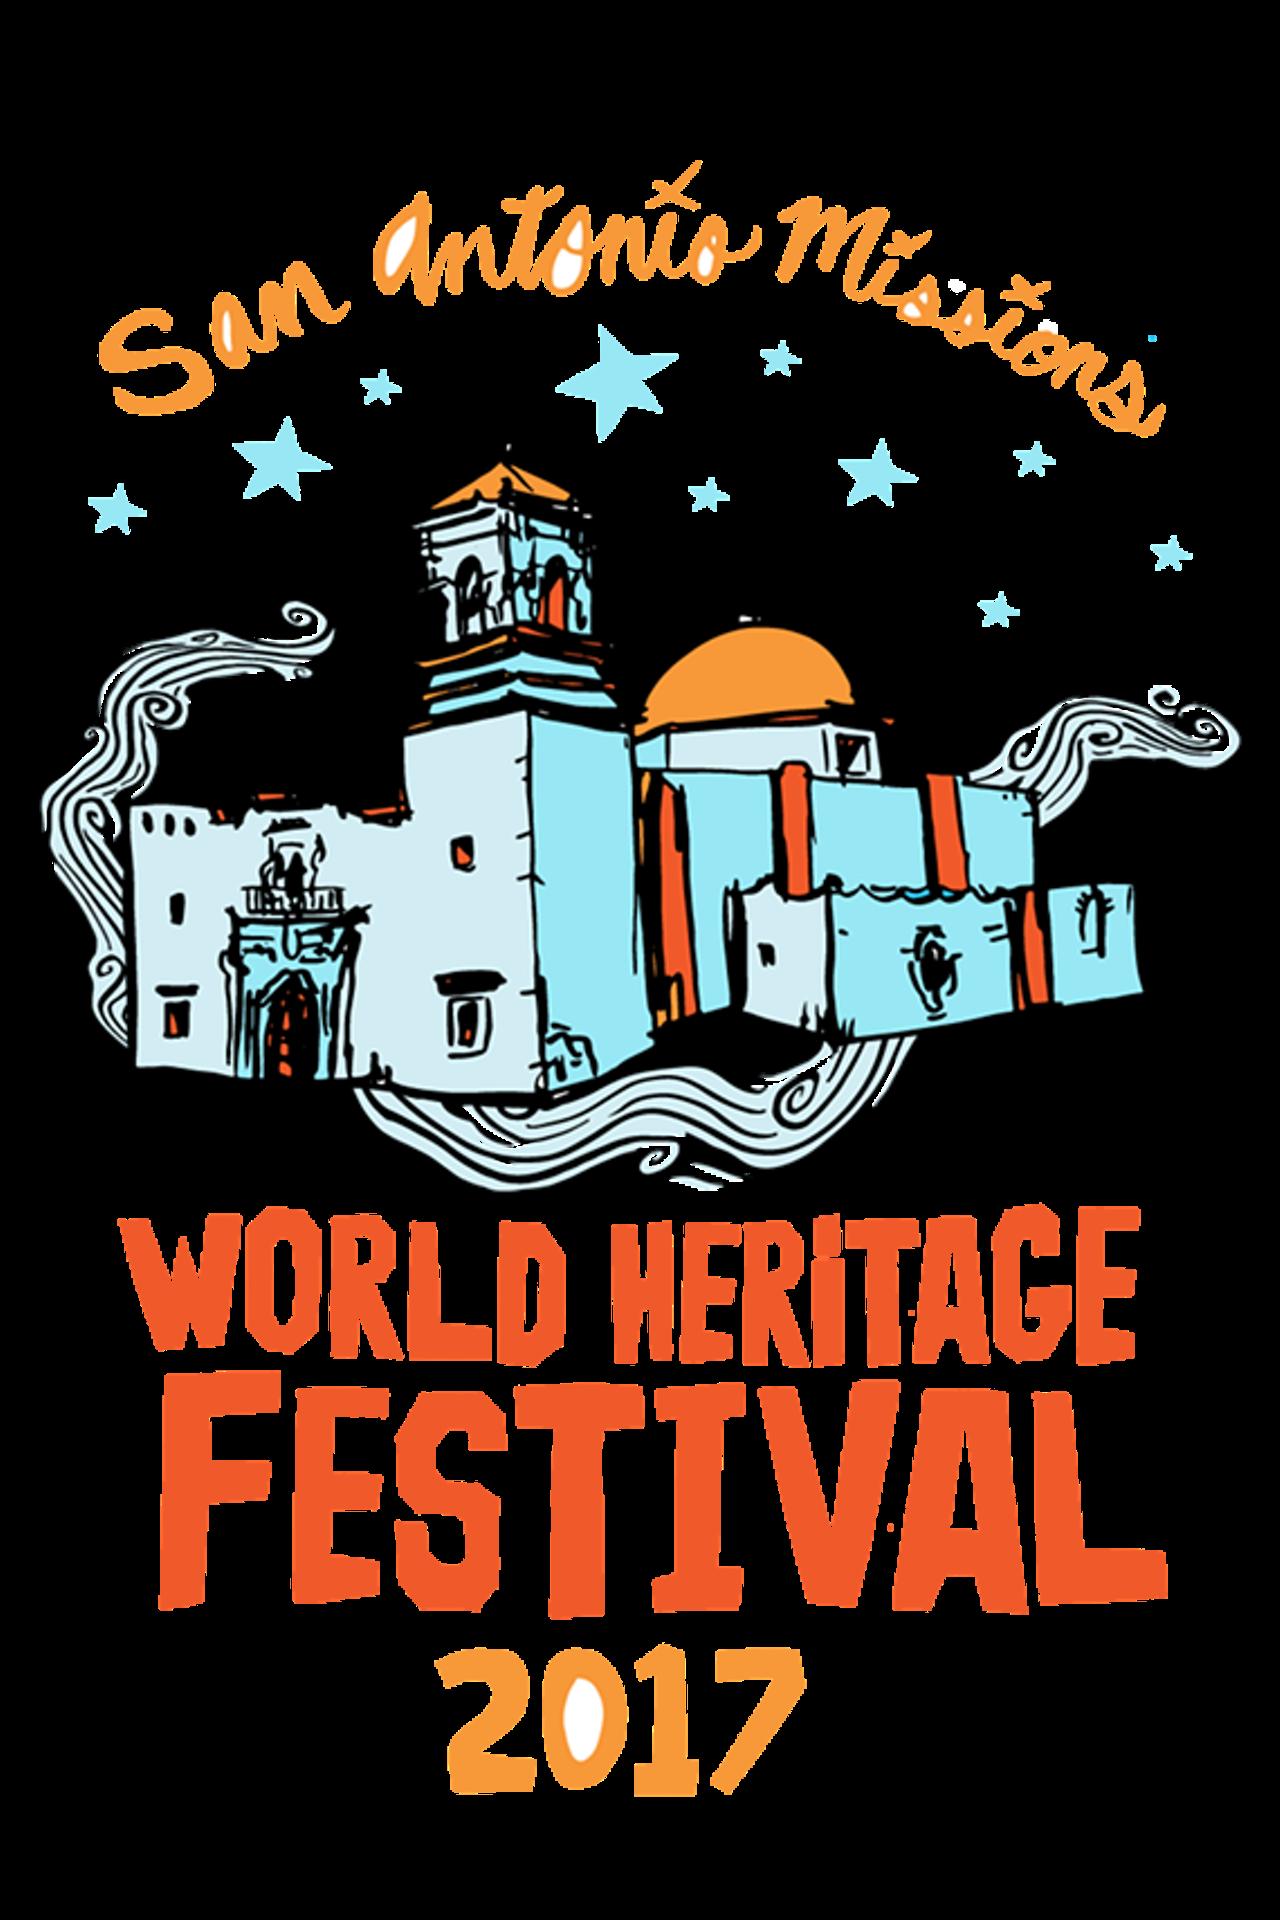 World Heritage Festival Brings 5 Days of Fun to the San Antonio ...